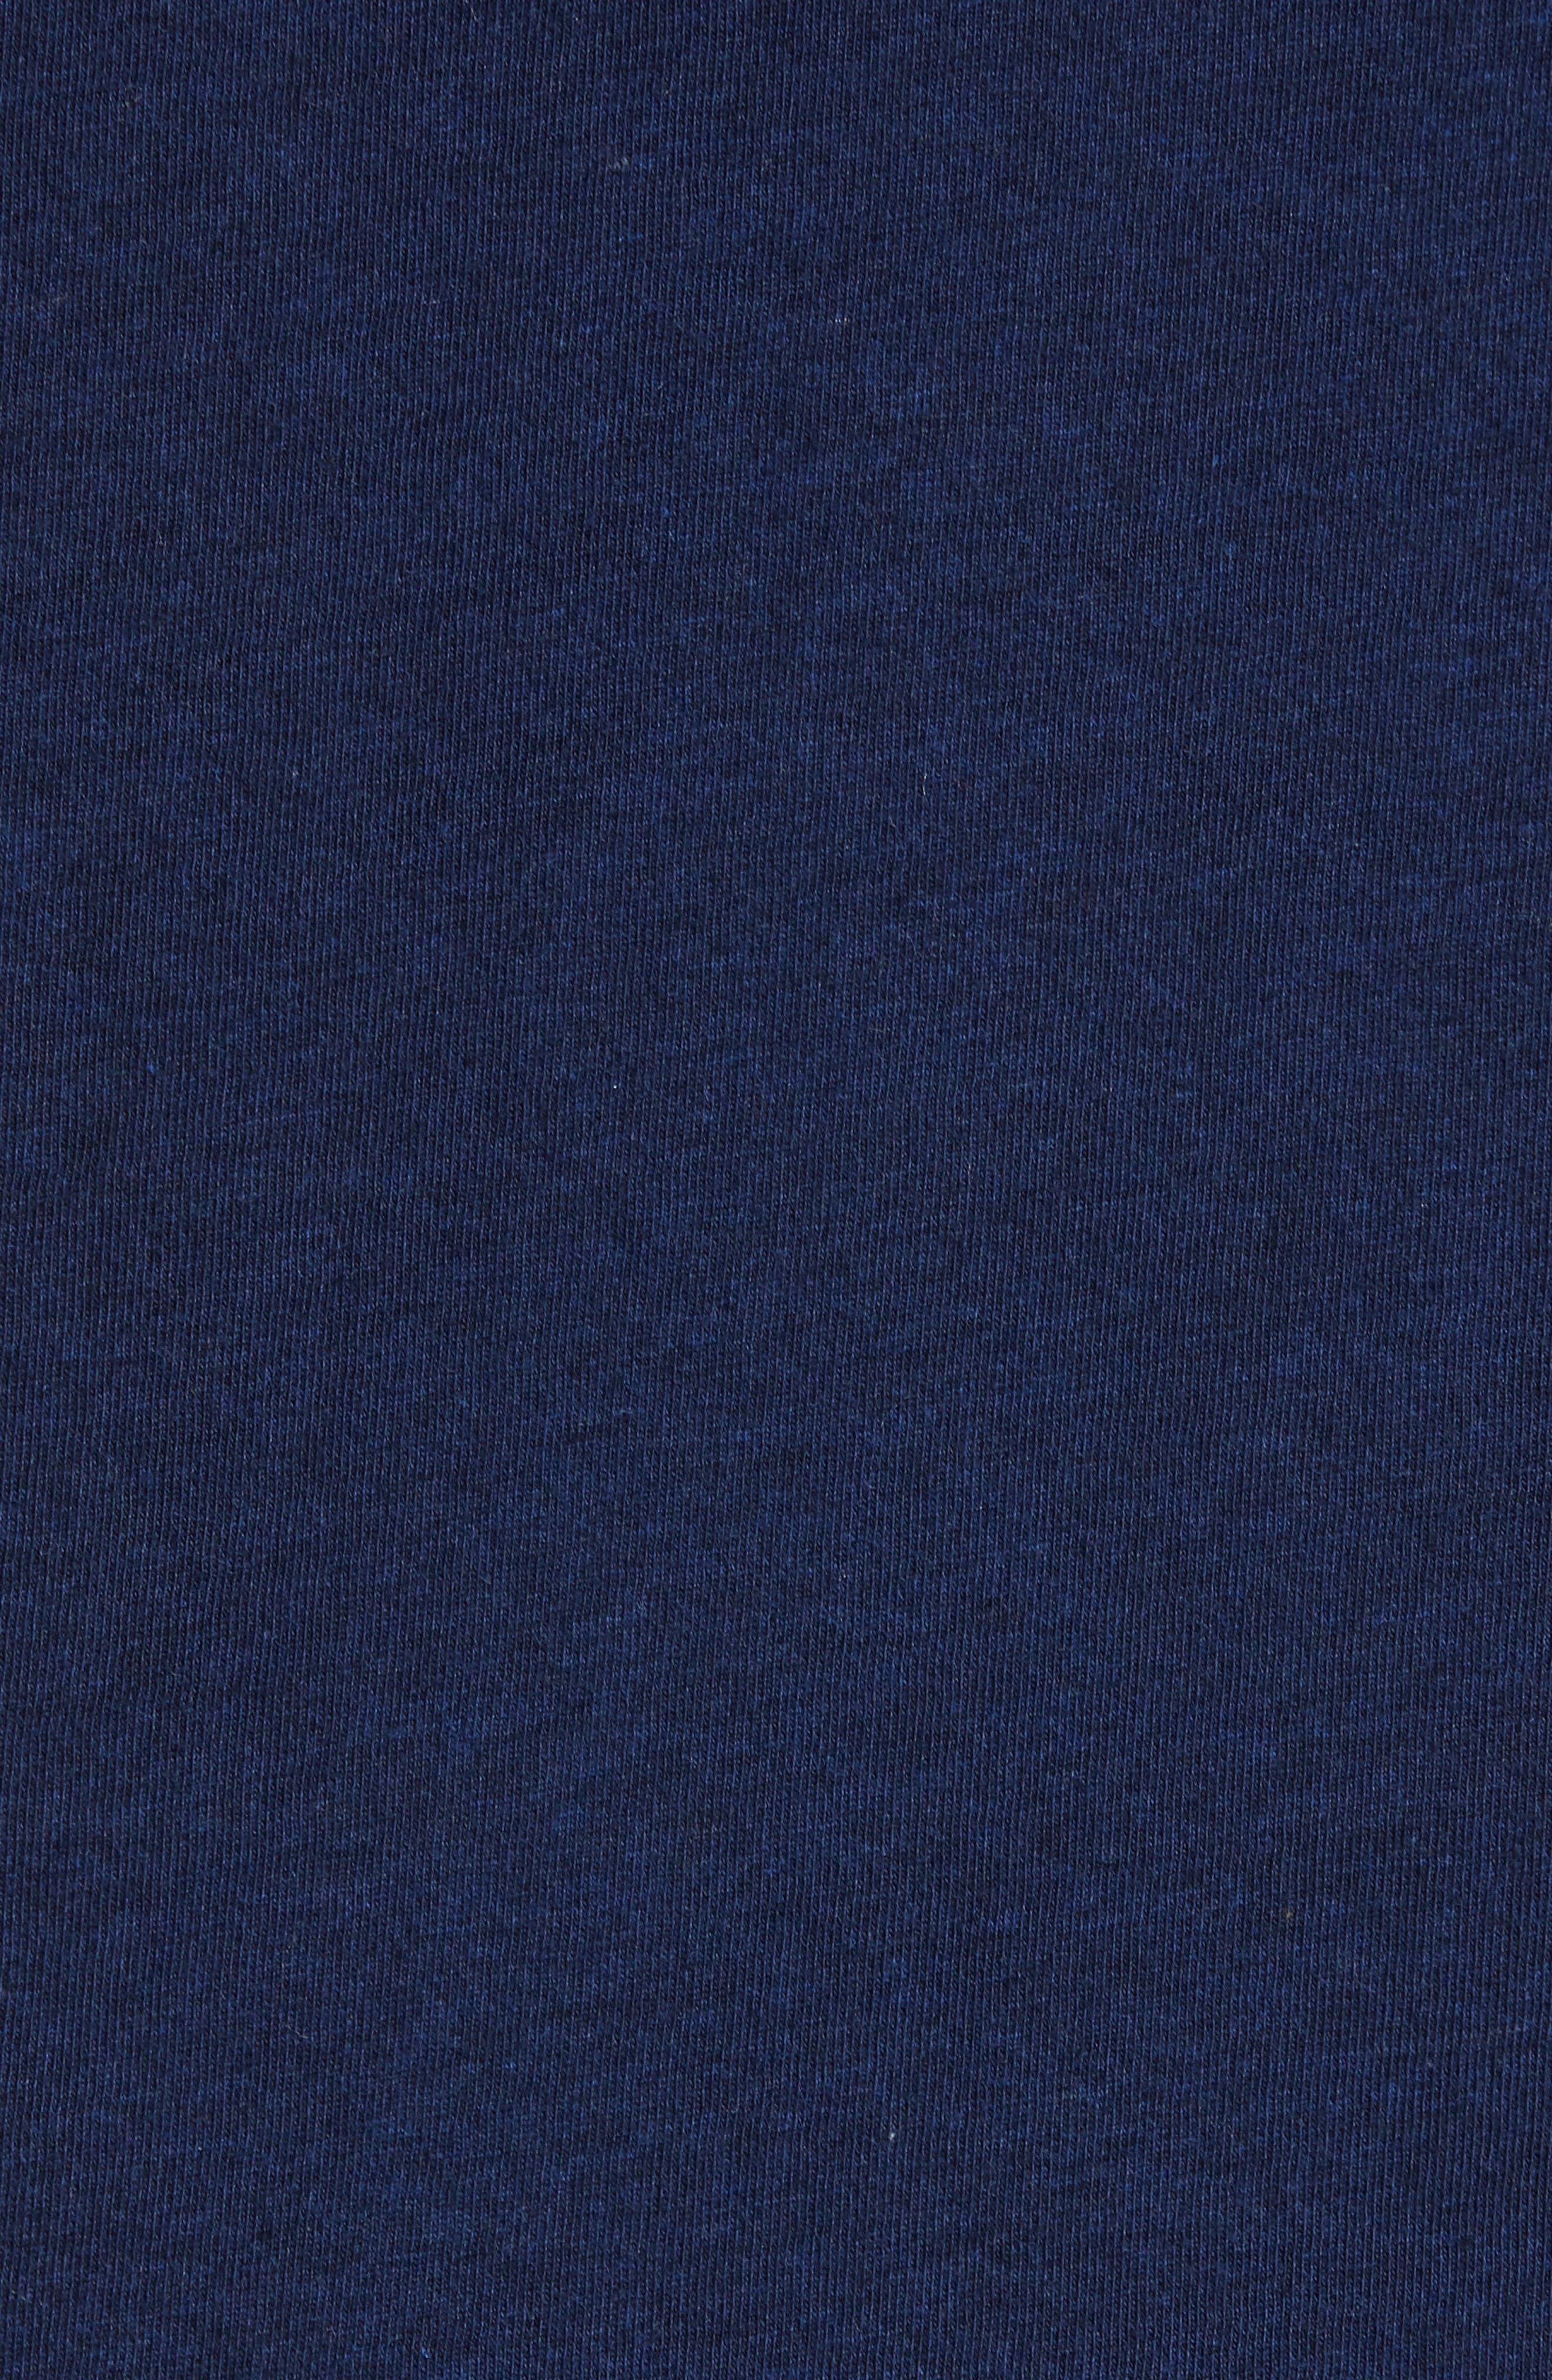 Patriotic Sail Regular Fit T-Shirt,                             Alternate thumbnail 5, color,